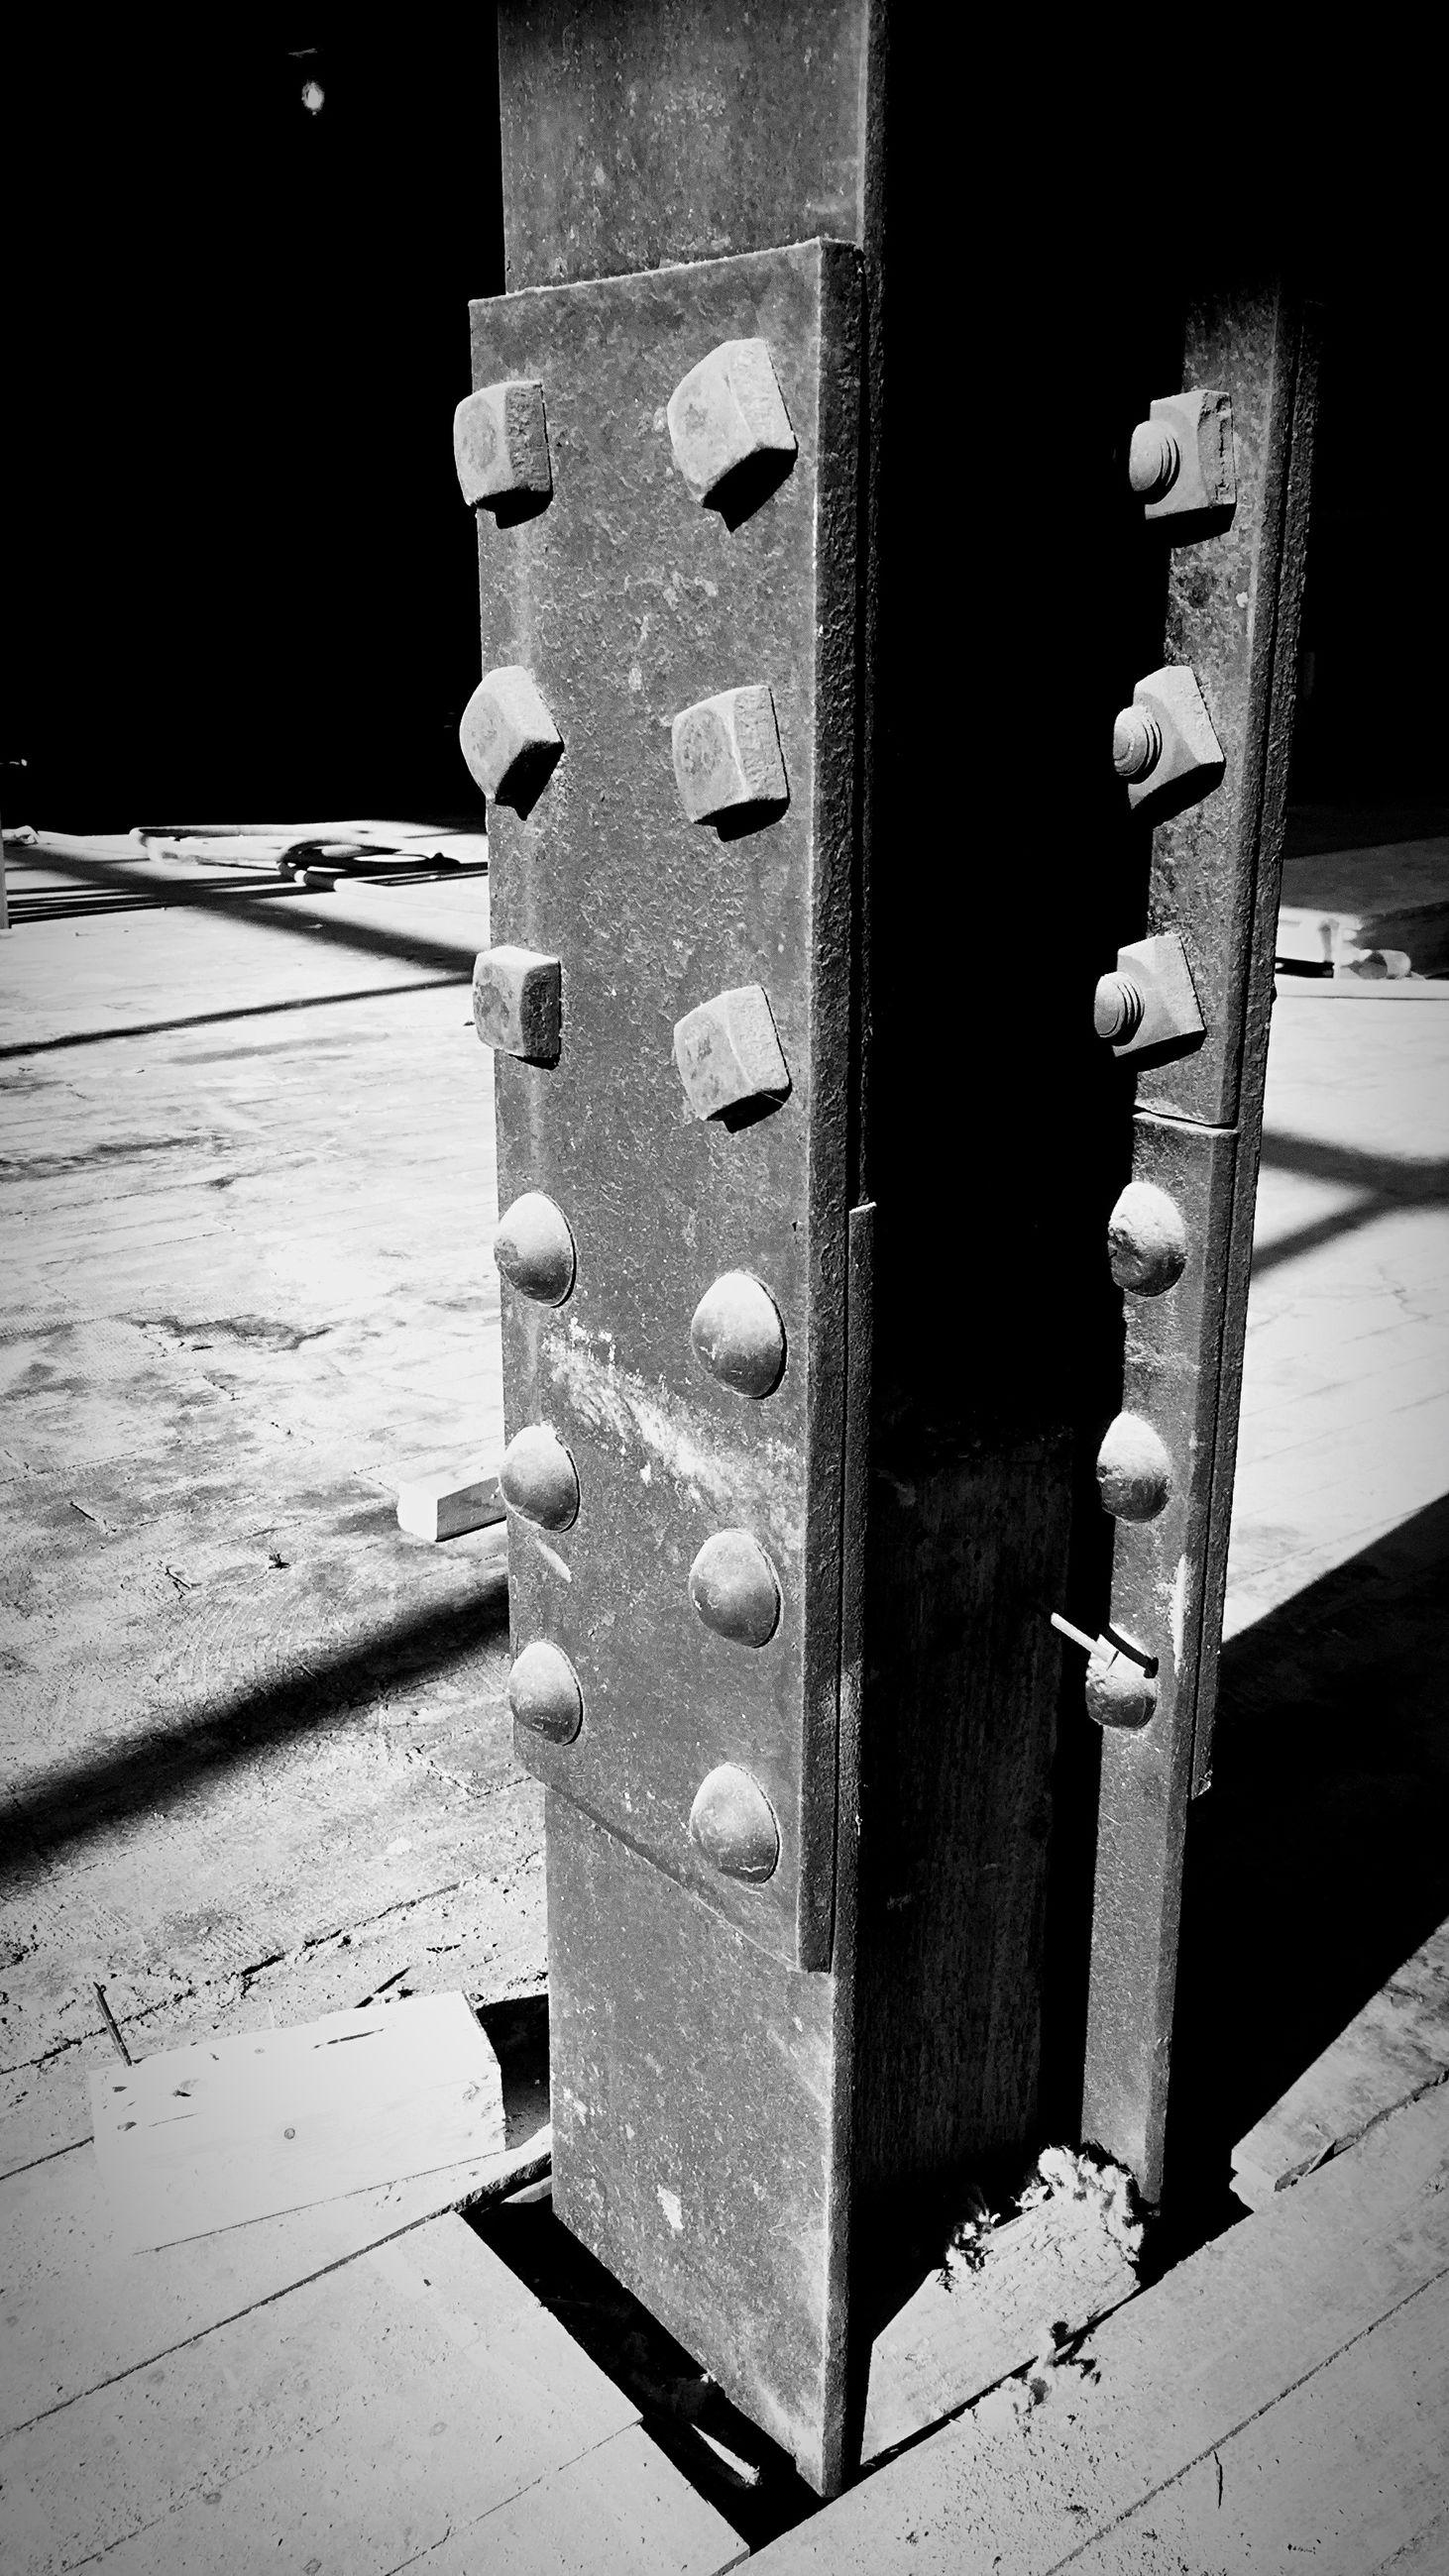 Close-up of metal girder